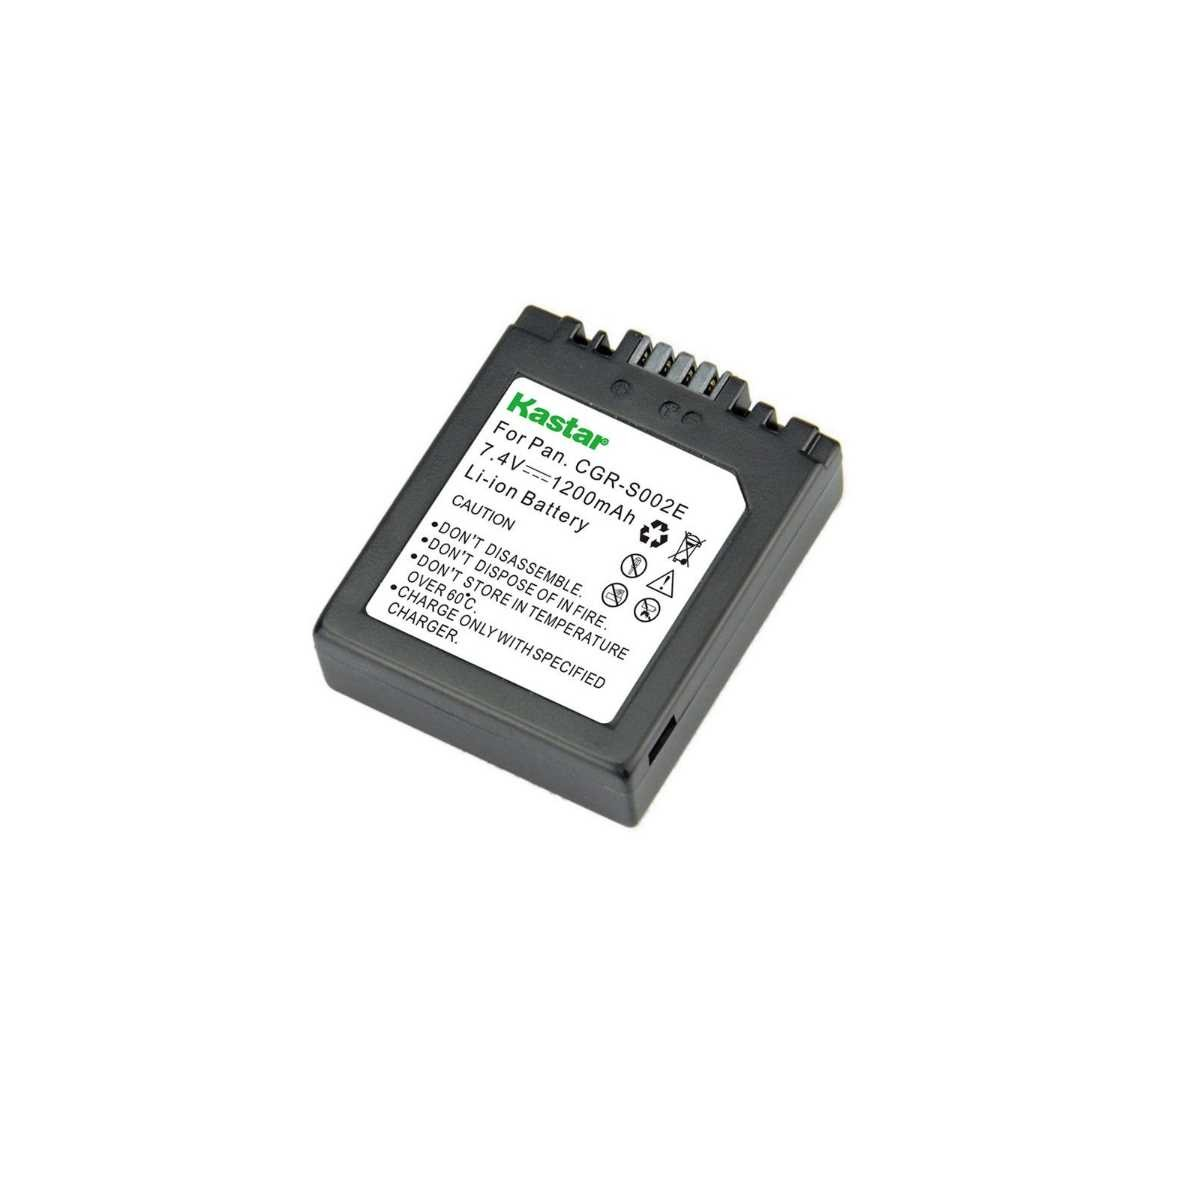 Filtro UV 67 mm multicoated 67mm turno más vergütet